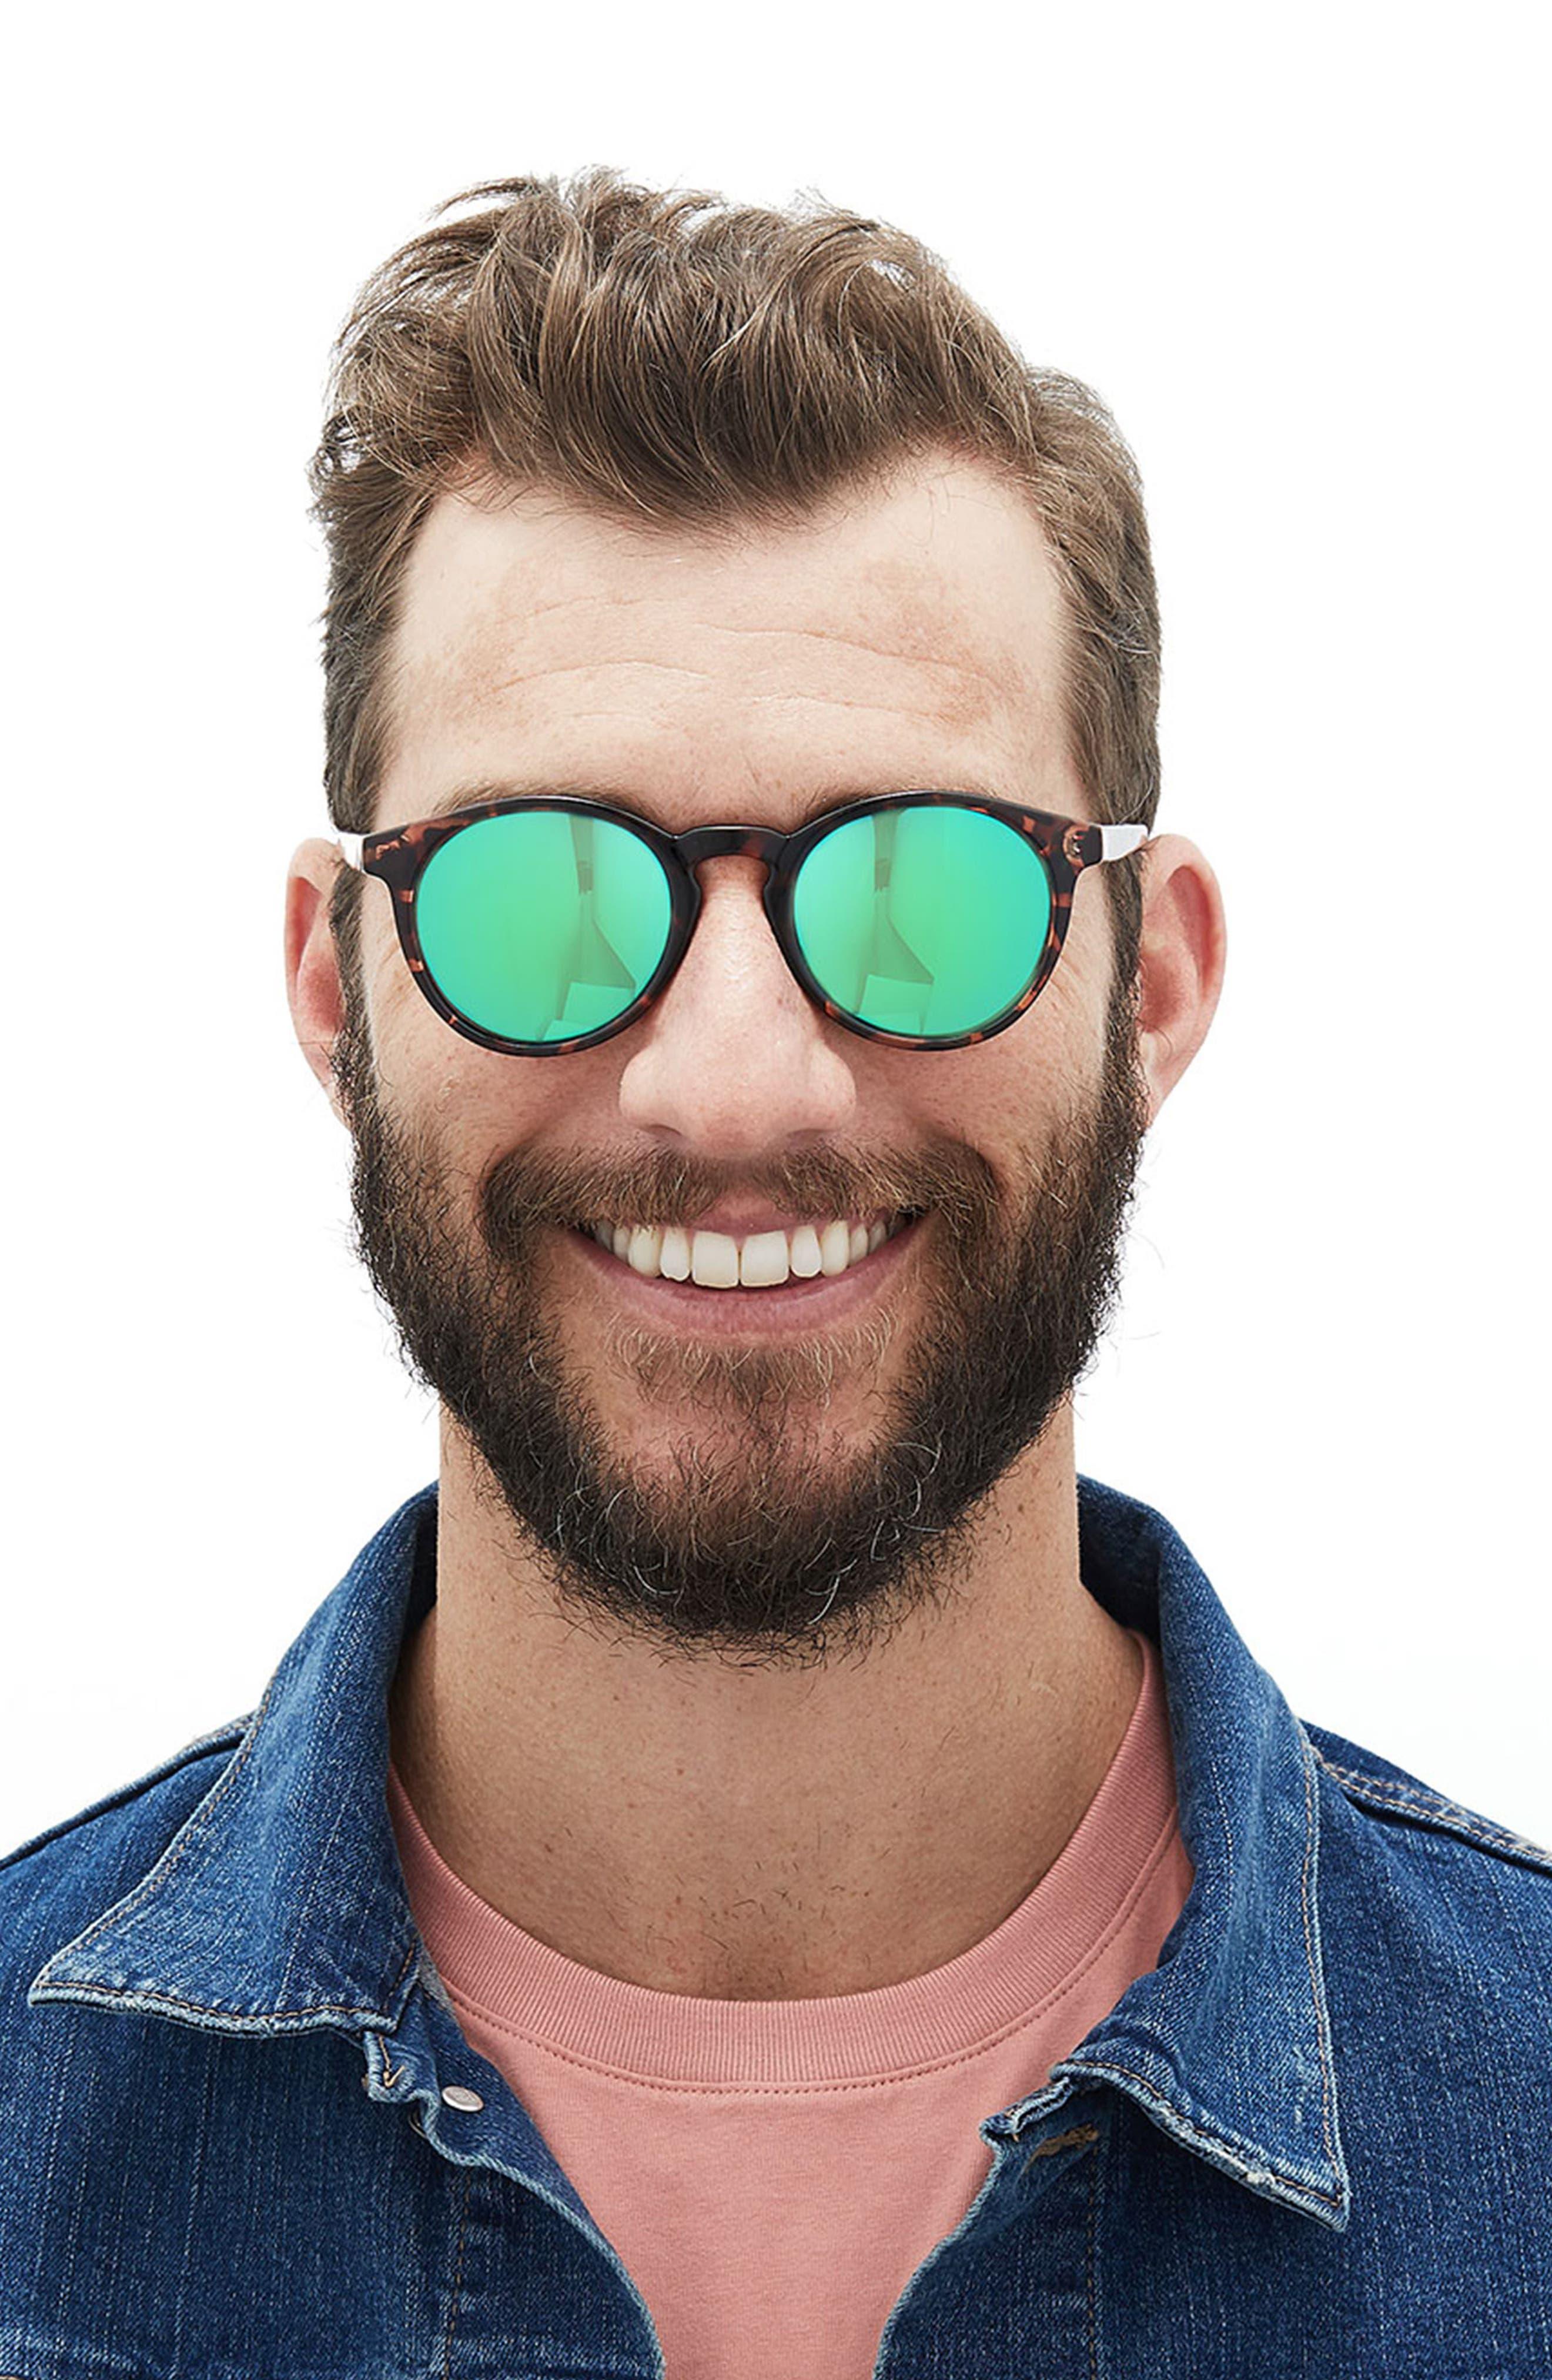 Dipsea 48mm Polarized Sunglasses,                             Alternate thumbnail 7, color,                             TORTOISE EMERALD